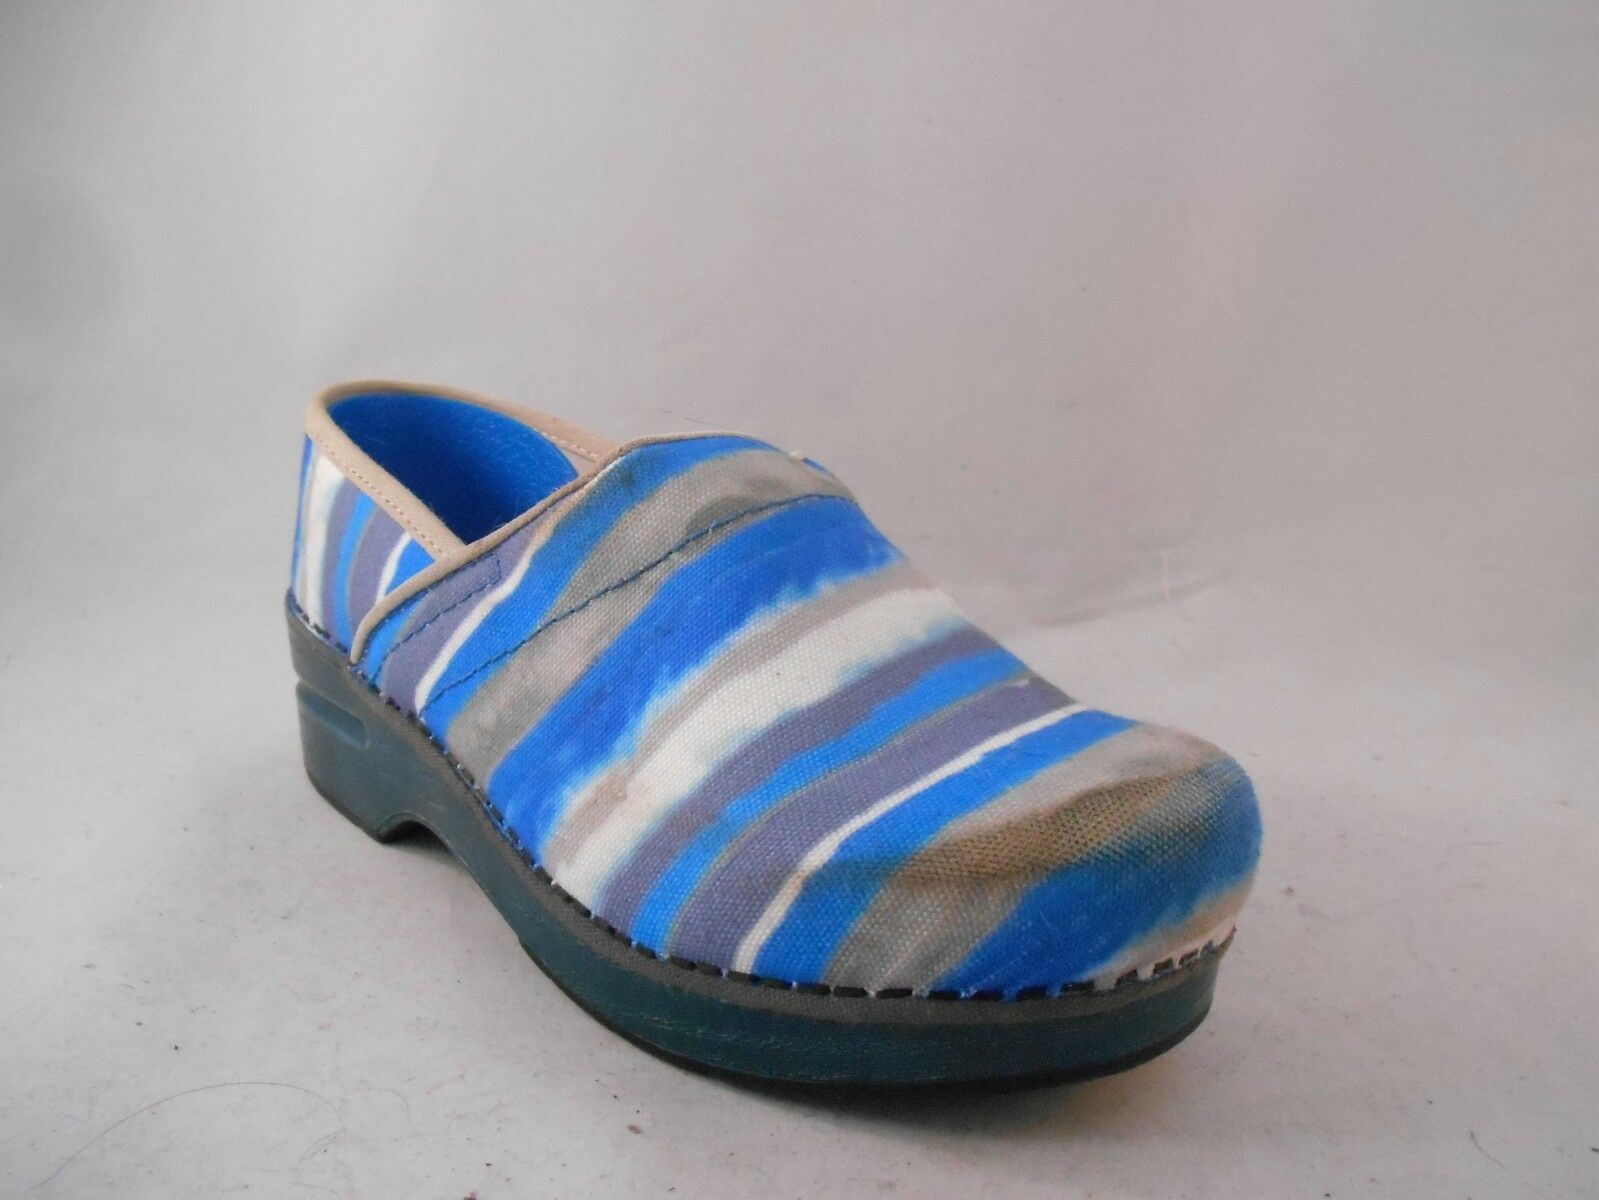 Dansko bluee Watercolor Stripe Canvas shoes Clogs Wmn's 36 EU   5.5 - 6 US